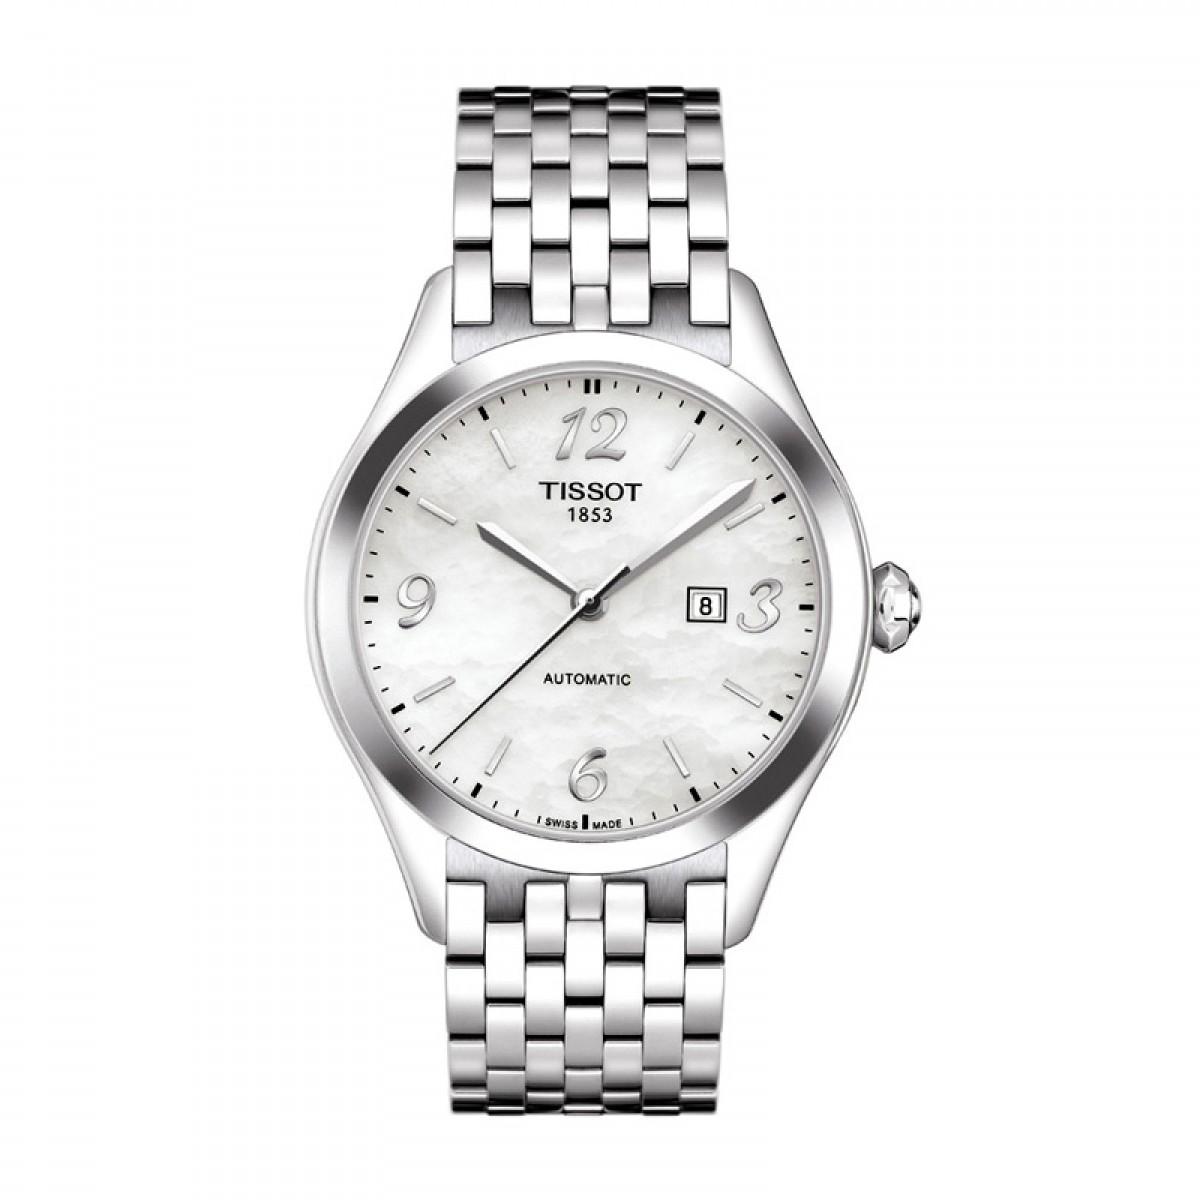 Часовник Tissot T038.207.11.117.00